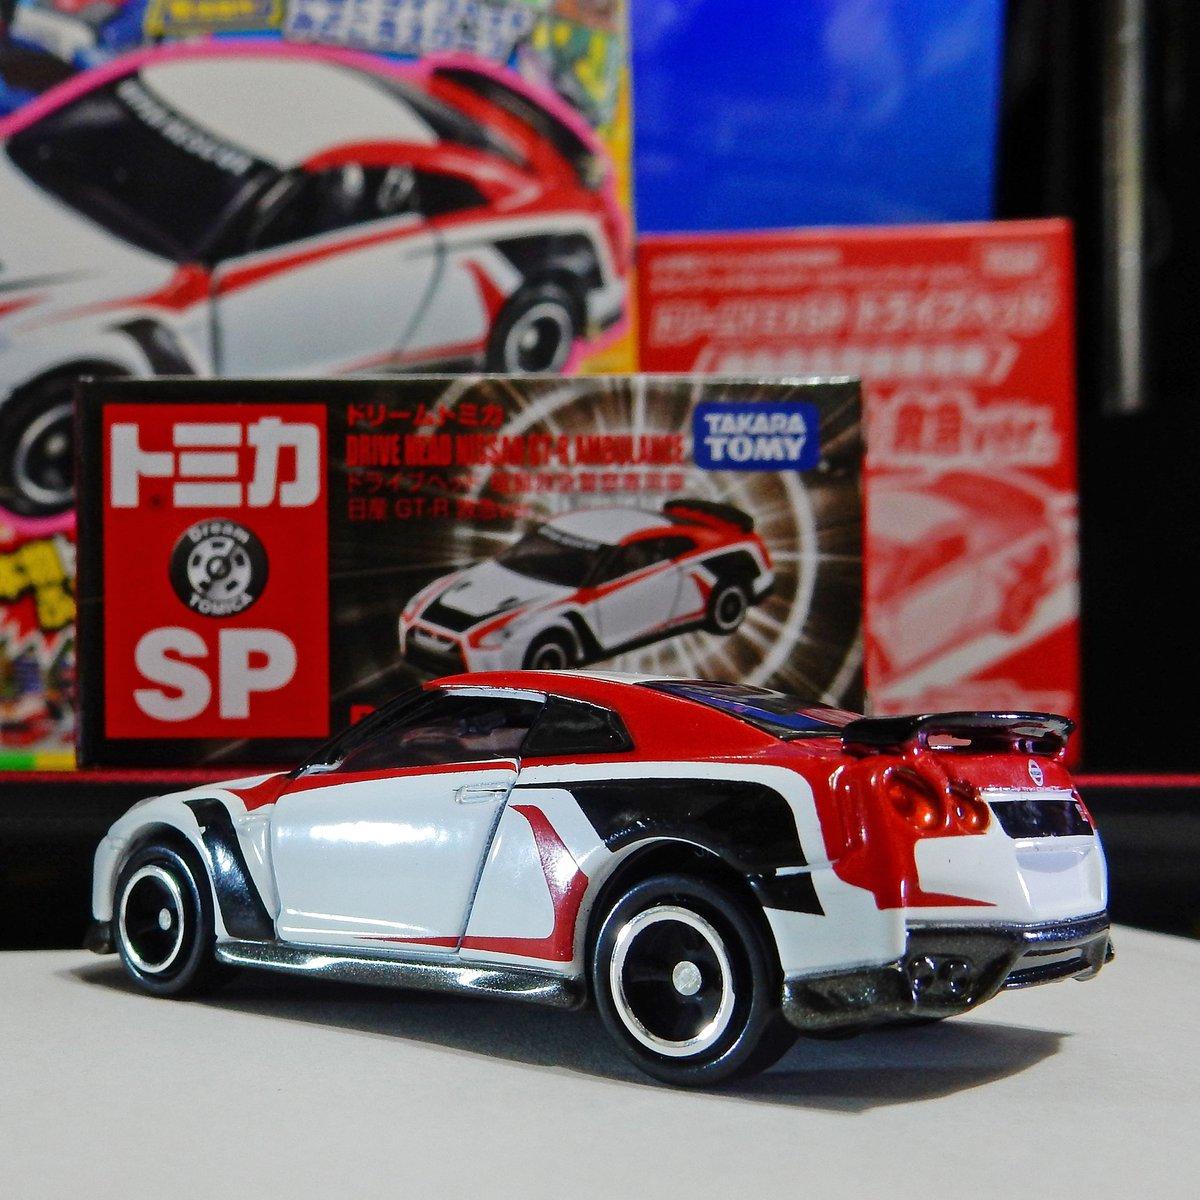 DREAM TOMICA DRIVER HEAD NISSAN GT-R AMBULANCE